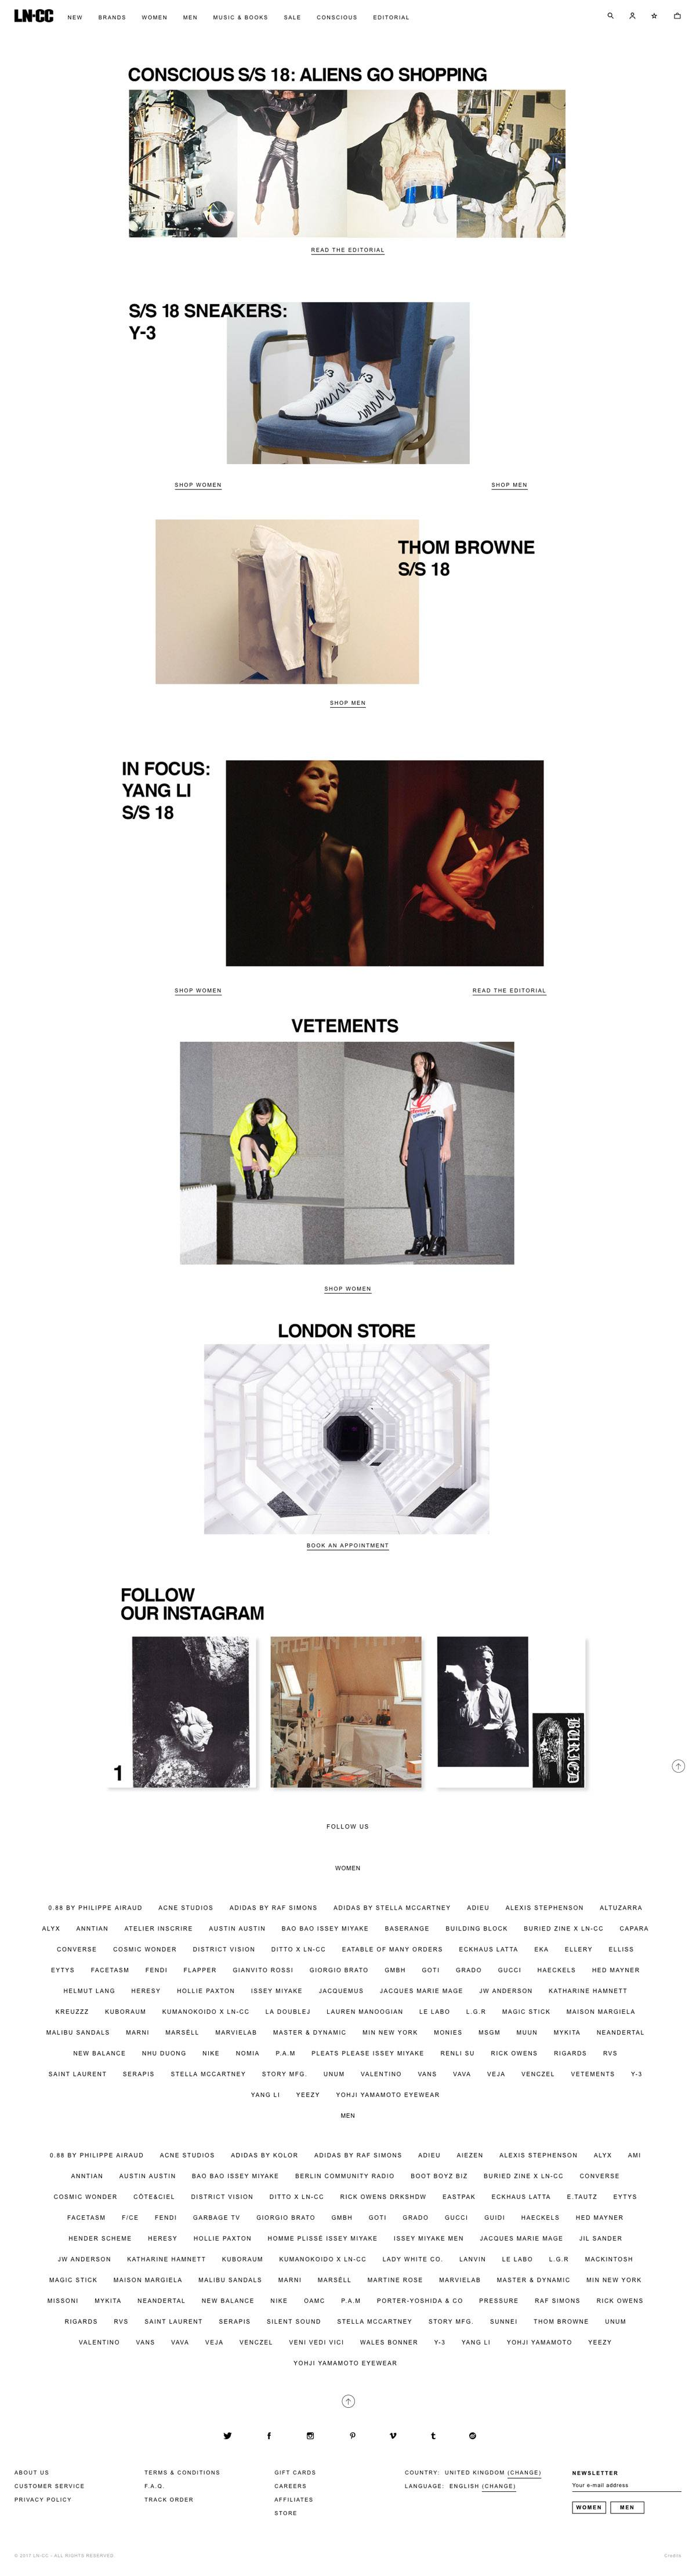 eCommerce website: LN-CC